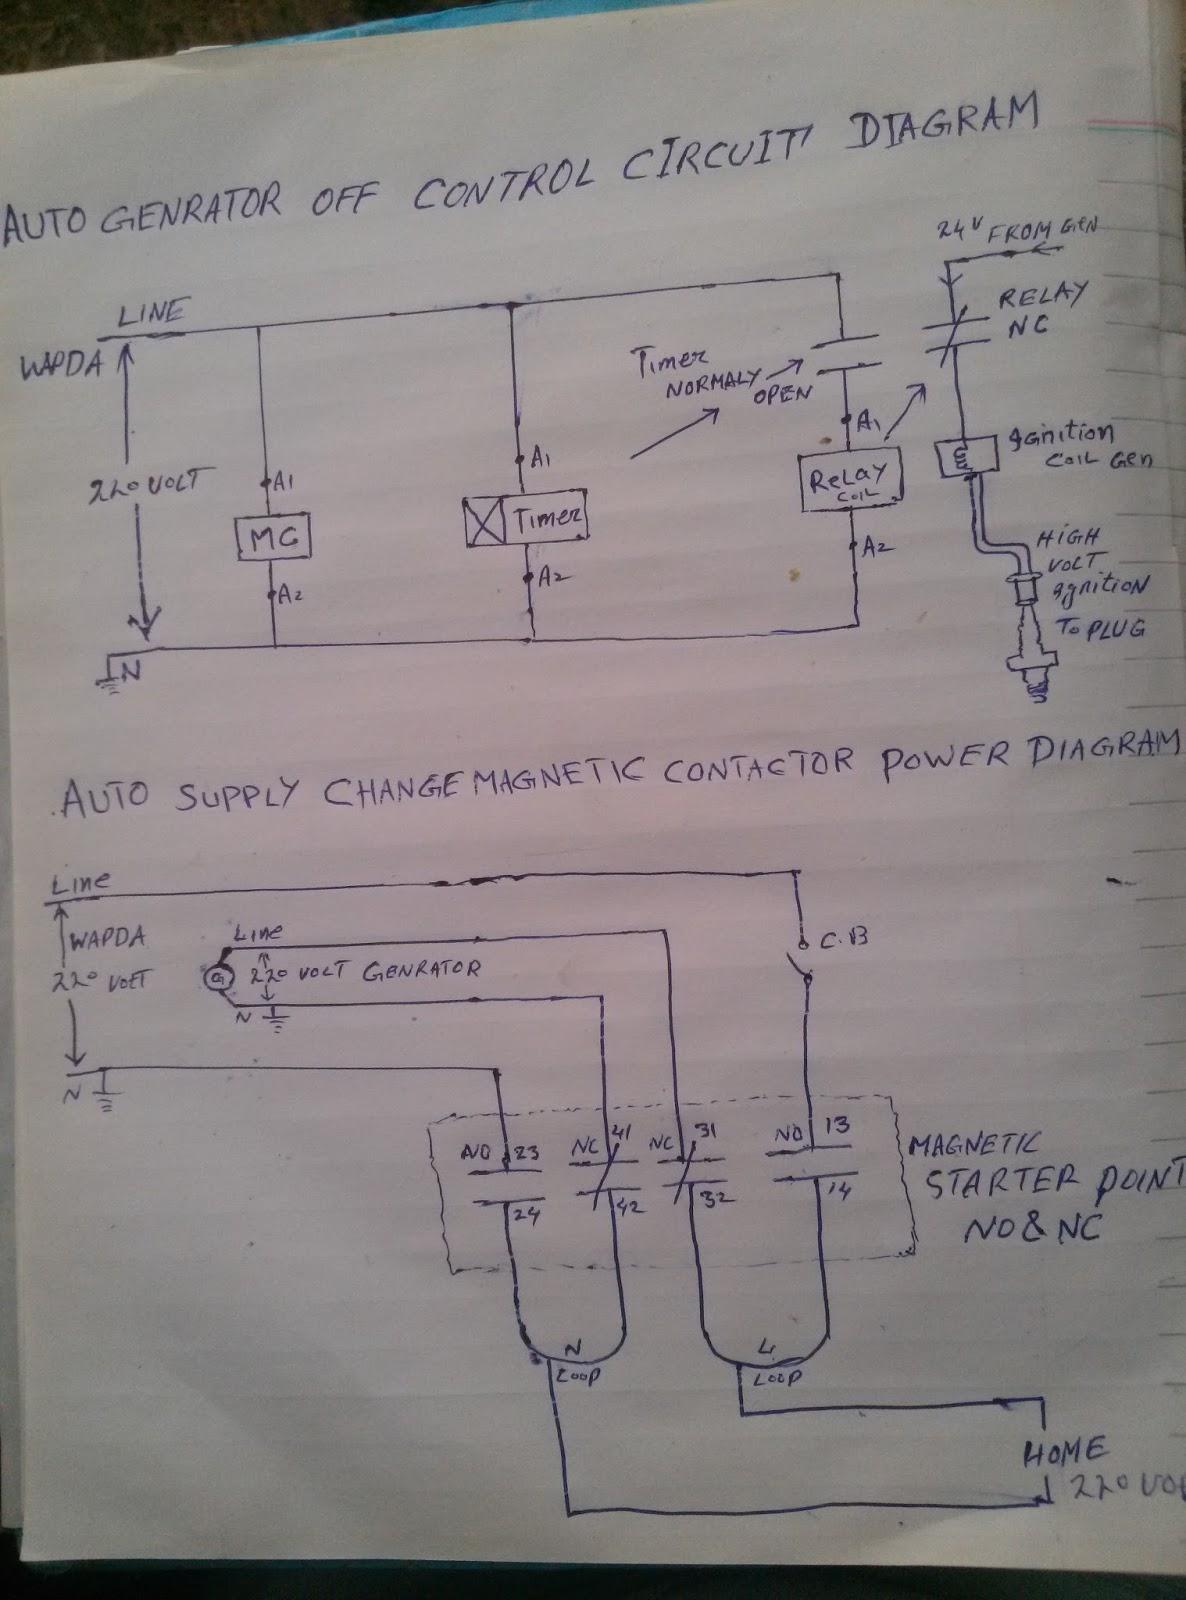 Motor Circuits Traffic Light Driver Circuit Controlcircuit Diagram Iss Tara Jub Wapda Supply Band Ho Gi Tu Aap Ka Computer Off Nahi Ga Or Ay Phir Be Stop Shukria